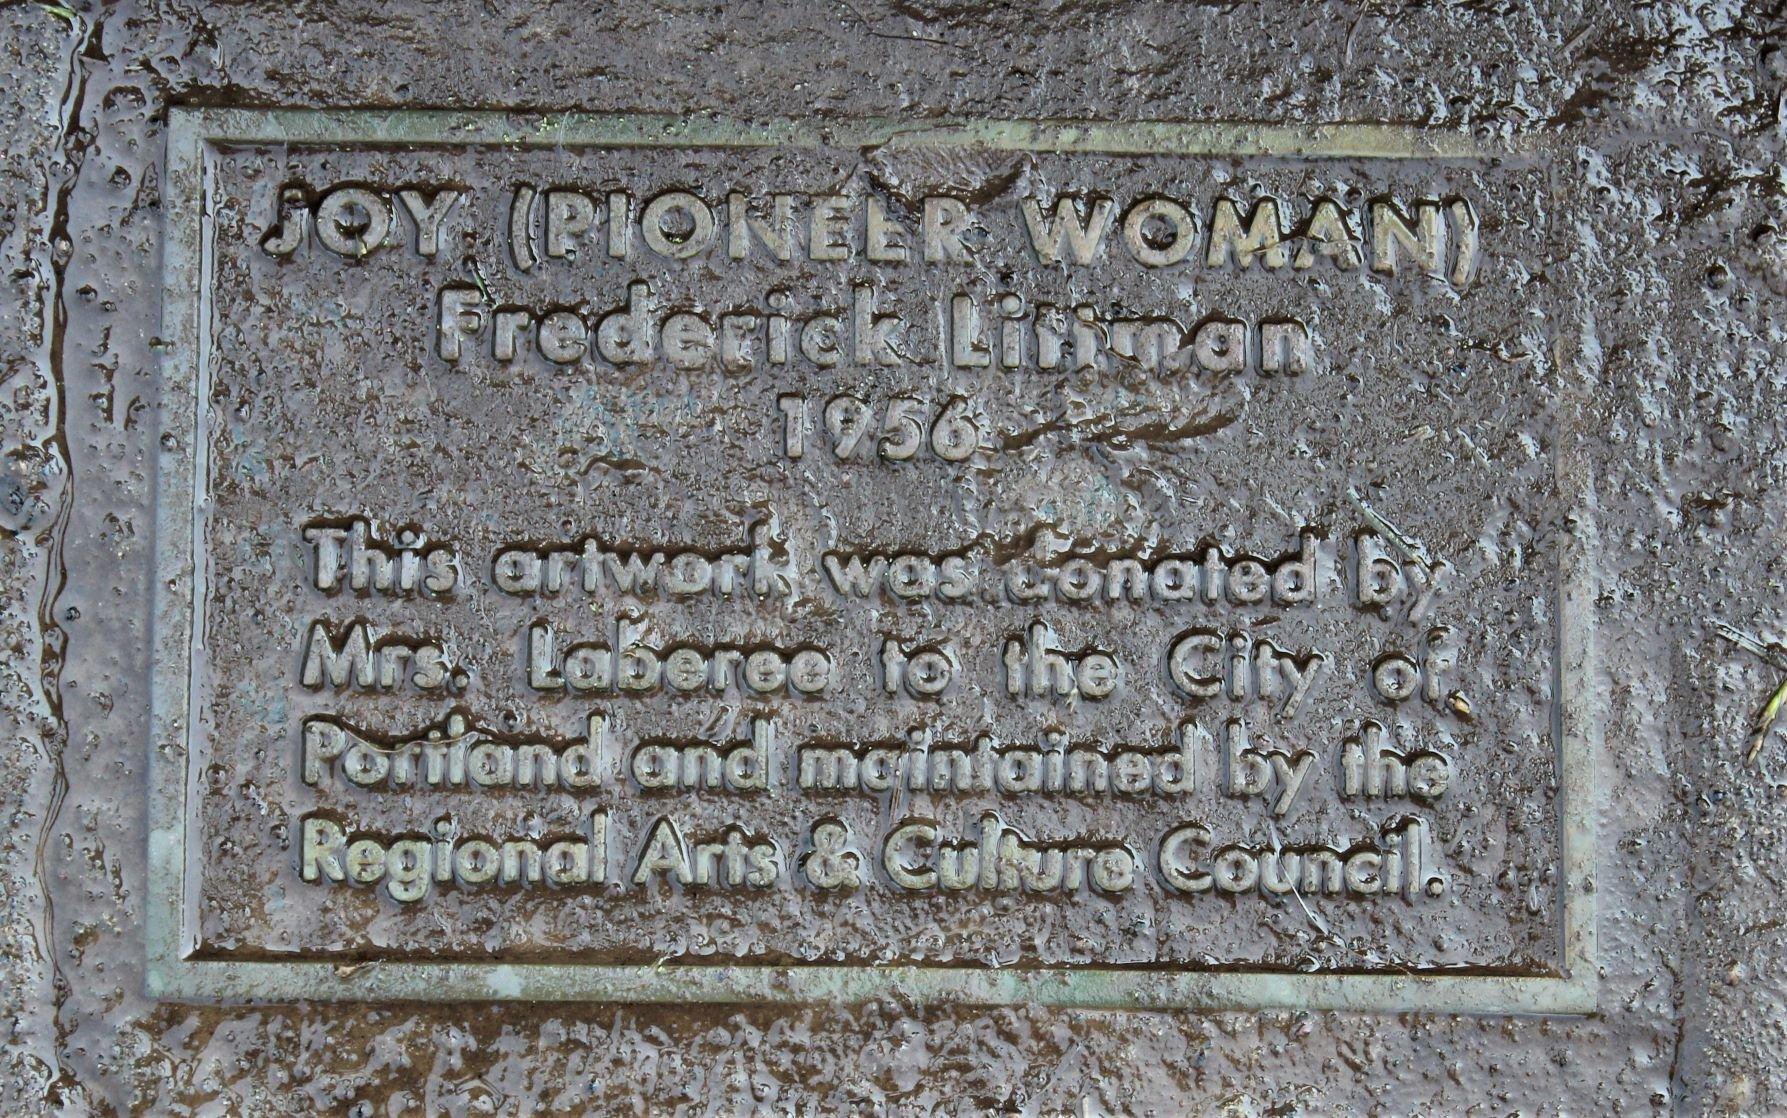 Joy (Pioneer Woman) plaque at base of fountain. Photo by Cynthia Prescott.